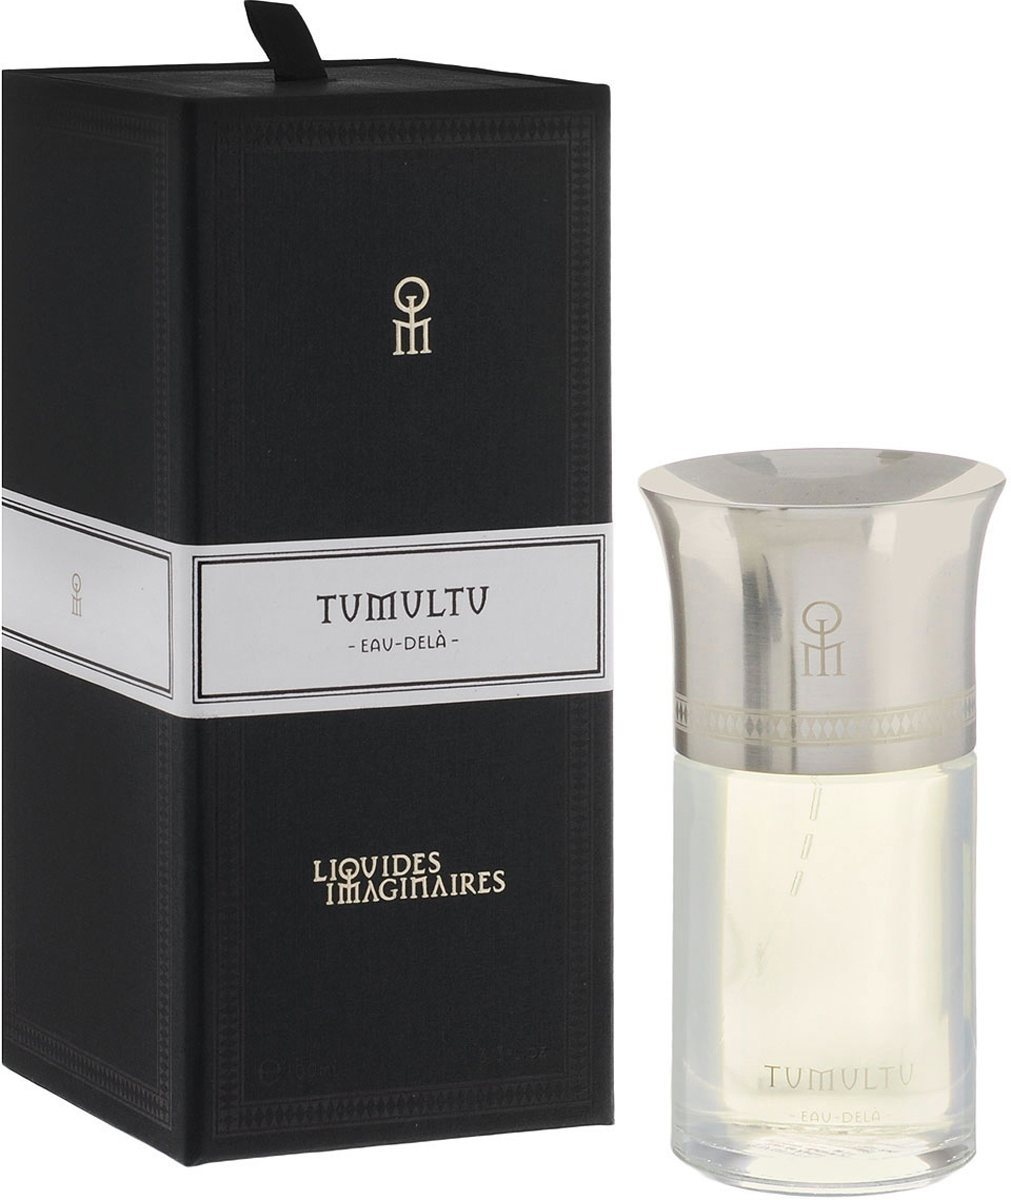 Les Liquides Imaginaires Парфюмерная вода Tumultu, унисекс, 100 мл производители деионизированная вода 5л